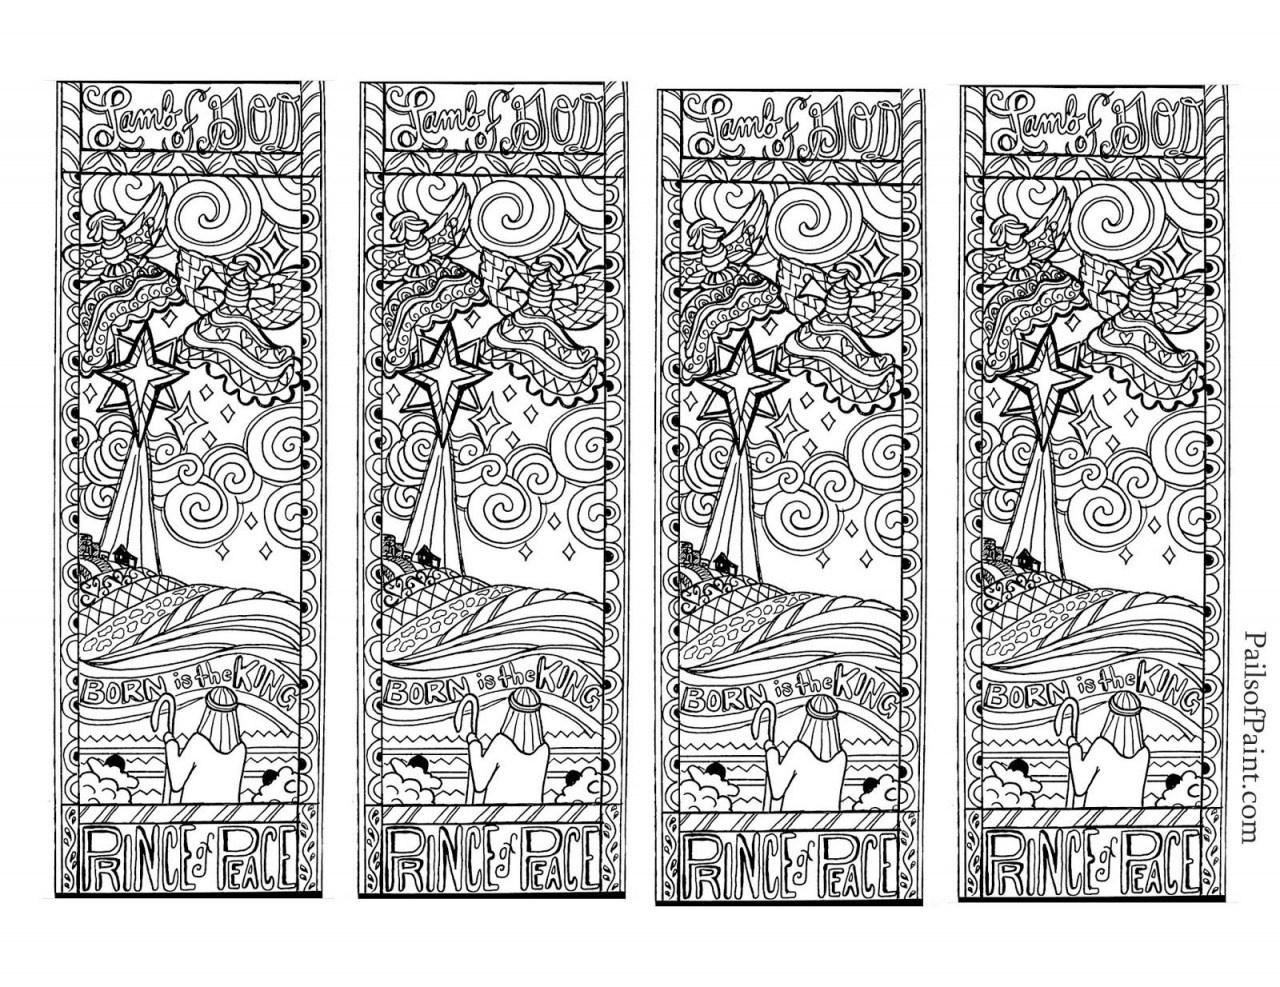 Bookmark Coloring Pages Bookmark Coloring Pages Free Printable - Free Printable Dragon Bookmarks